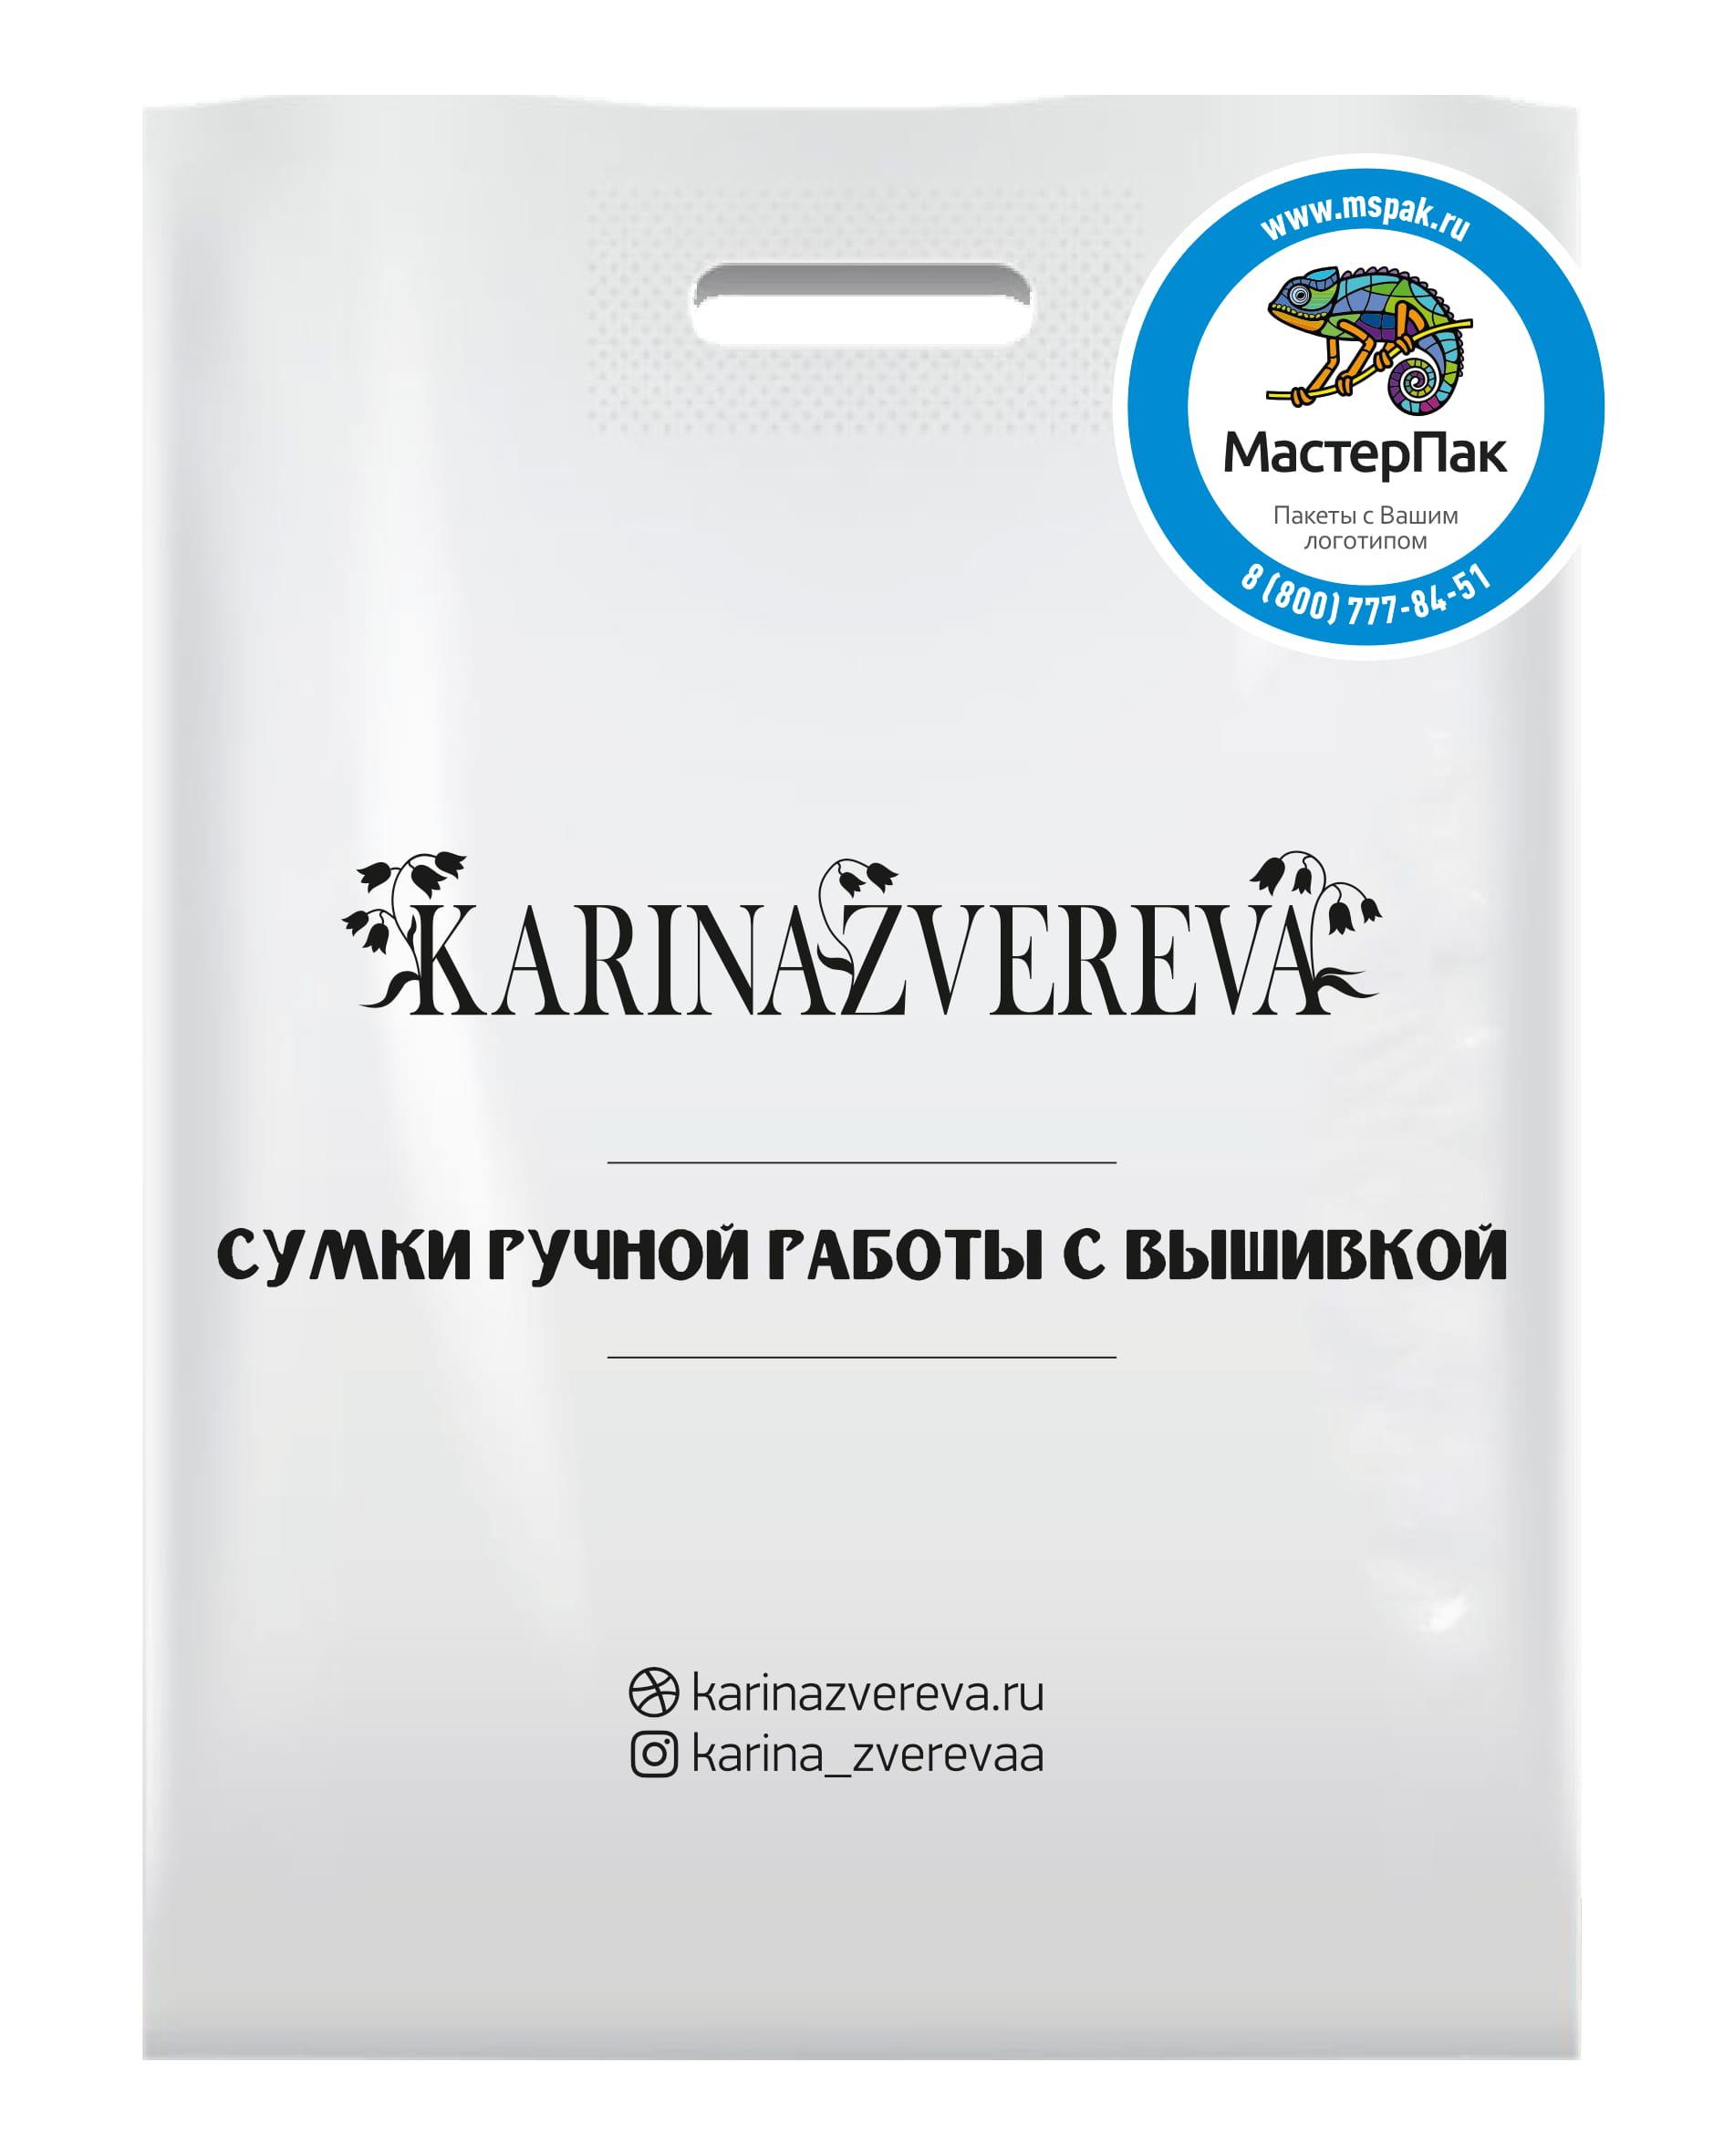 Пакет ПВД с логотипом Karina Zvereva, 70 мкм, 30*40, вырубная ручка